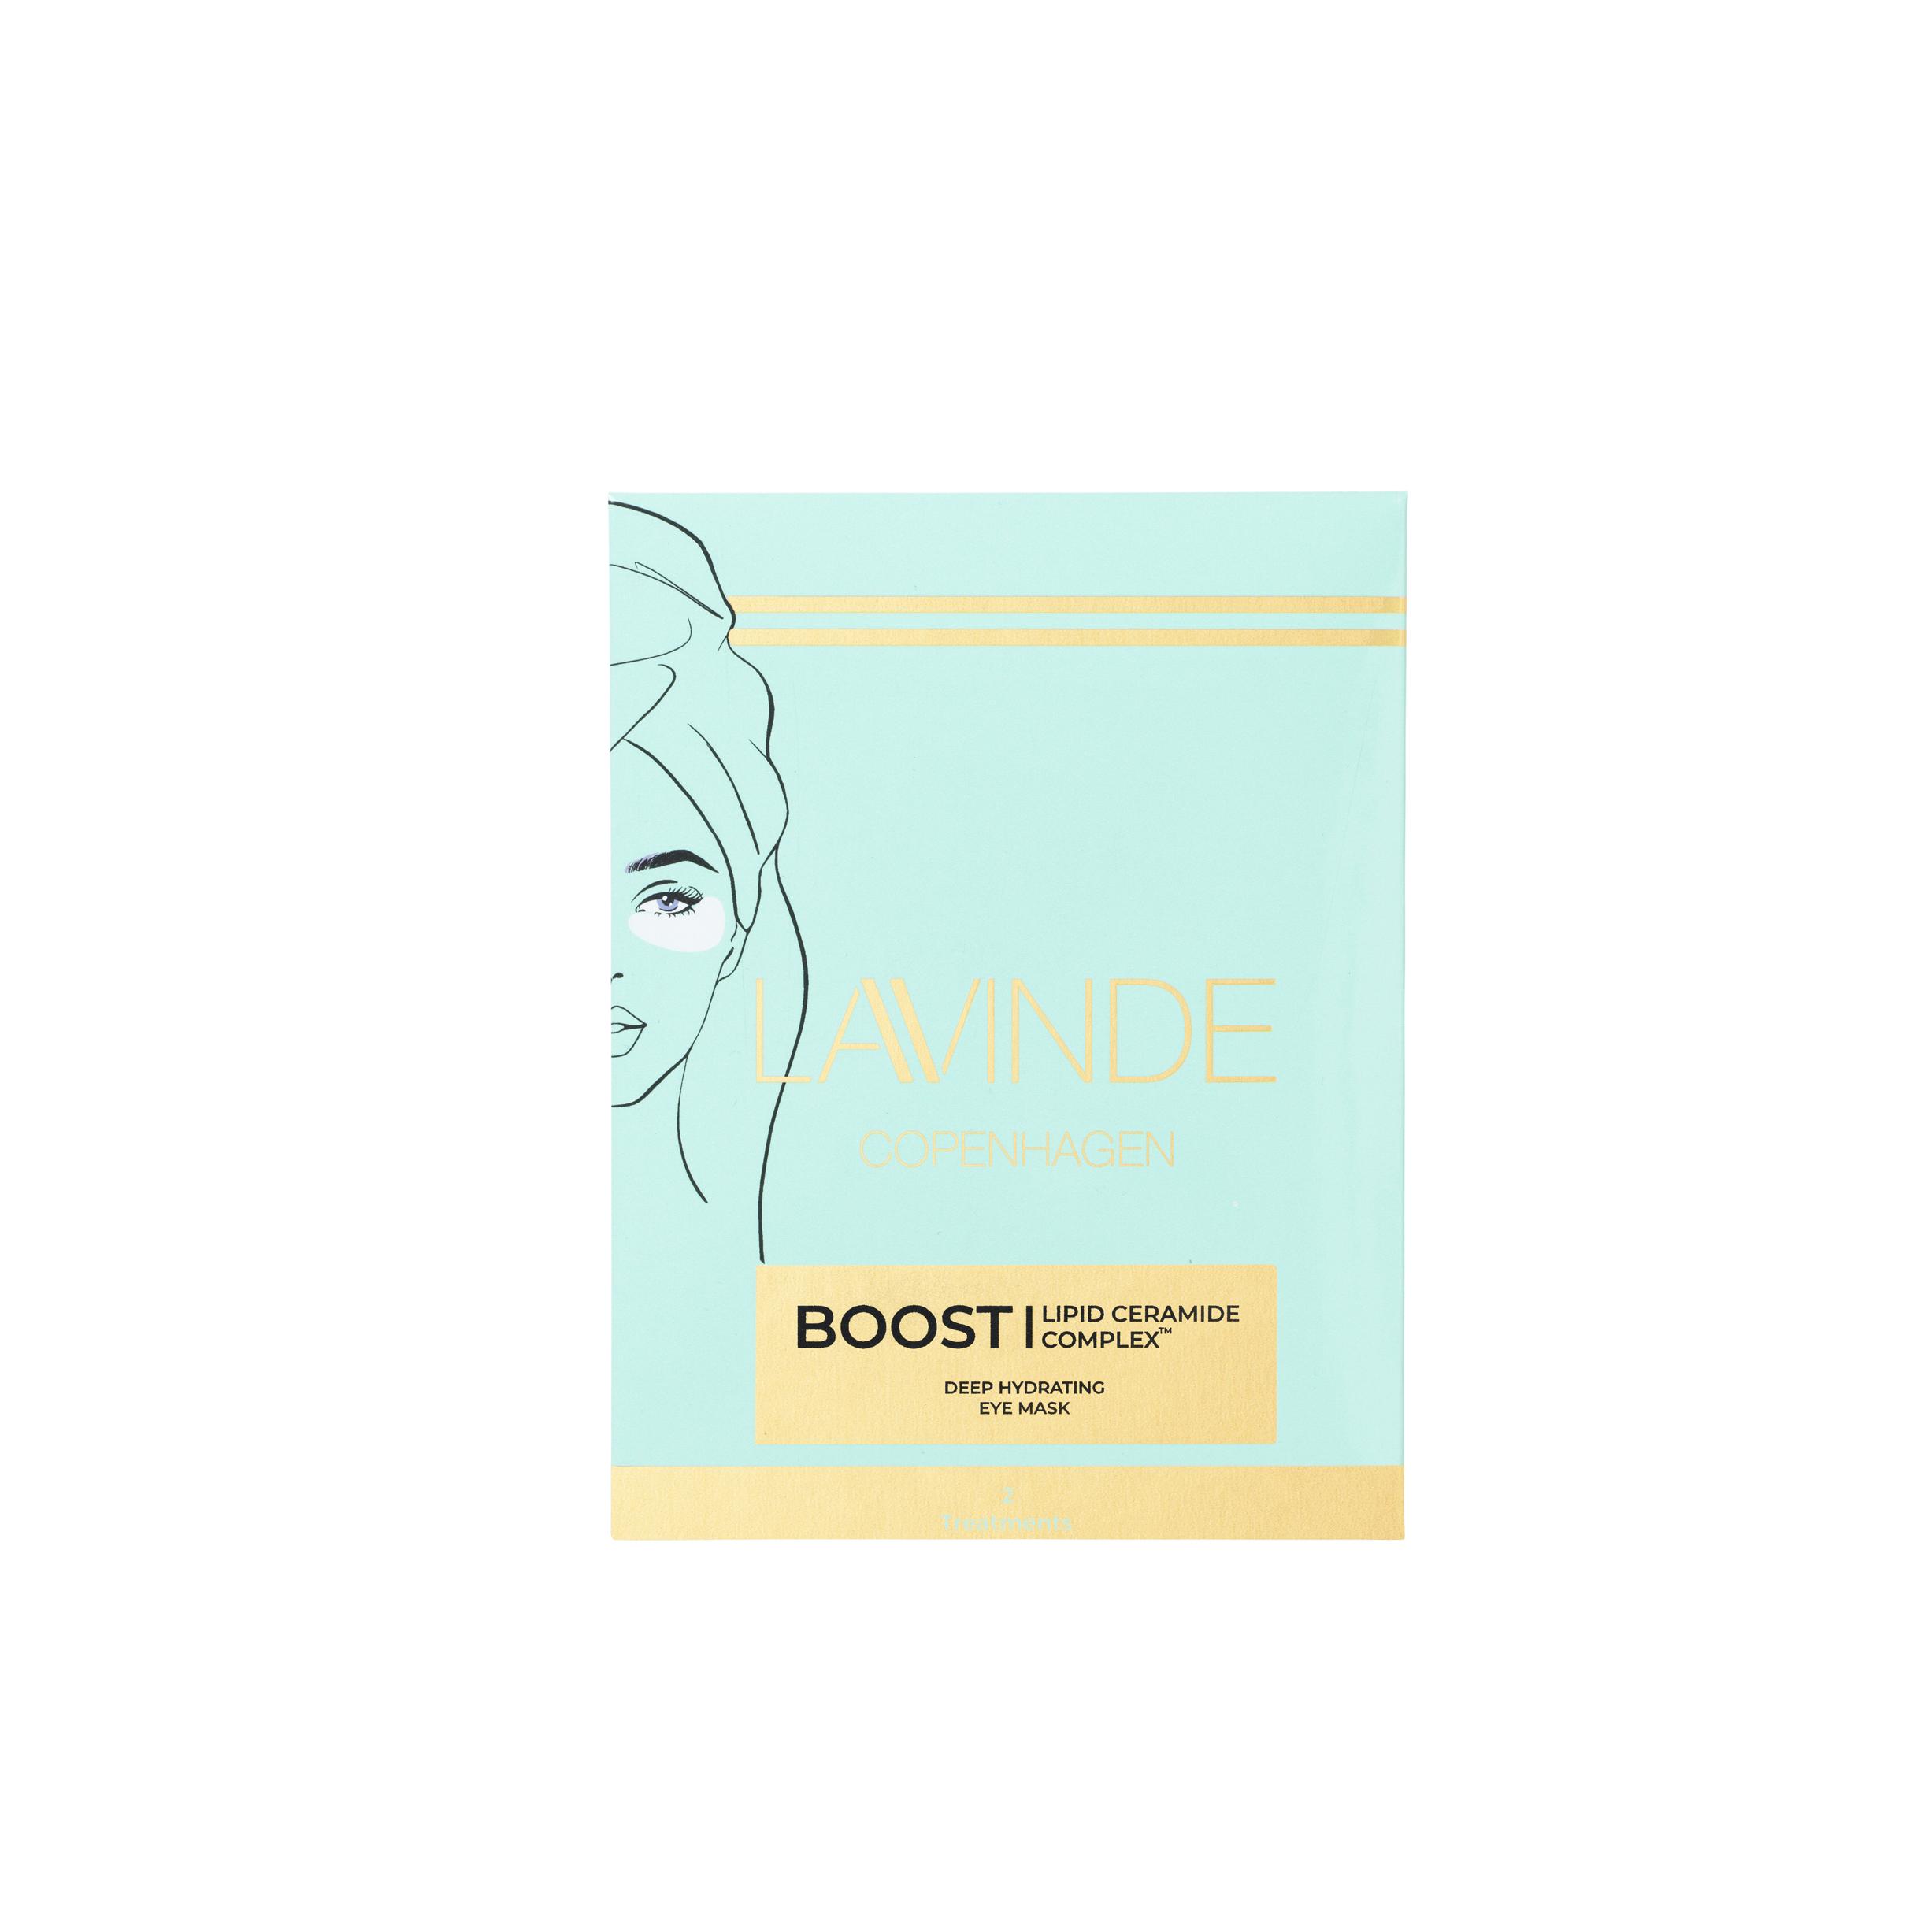 Lavinde Copenhagen - Boost Deep Hydrating Eye Mask - 2 Treatments